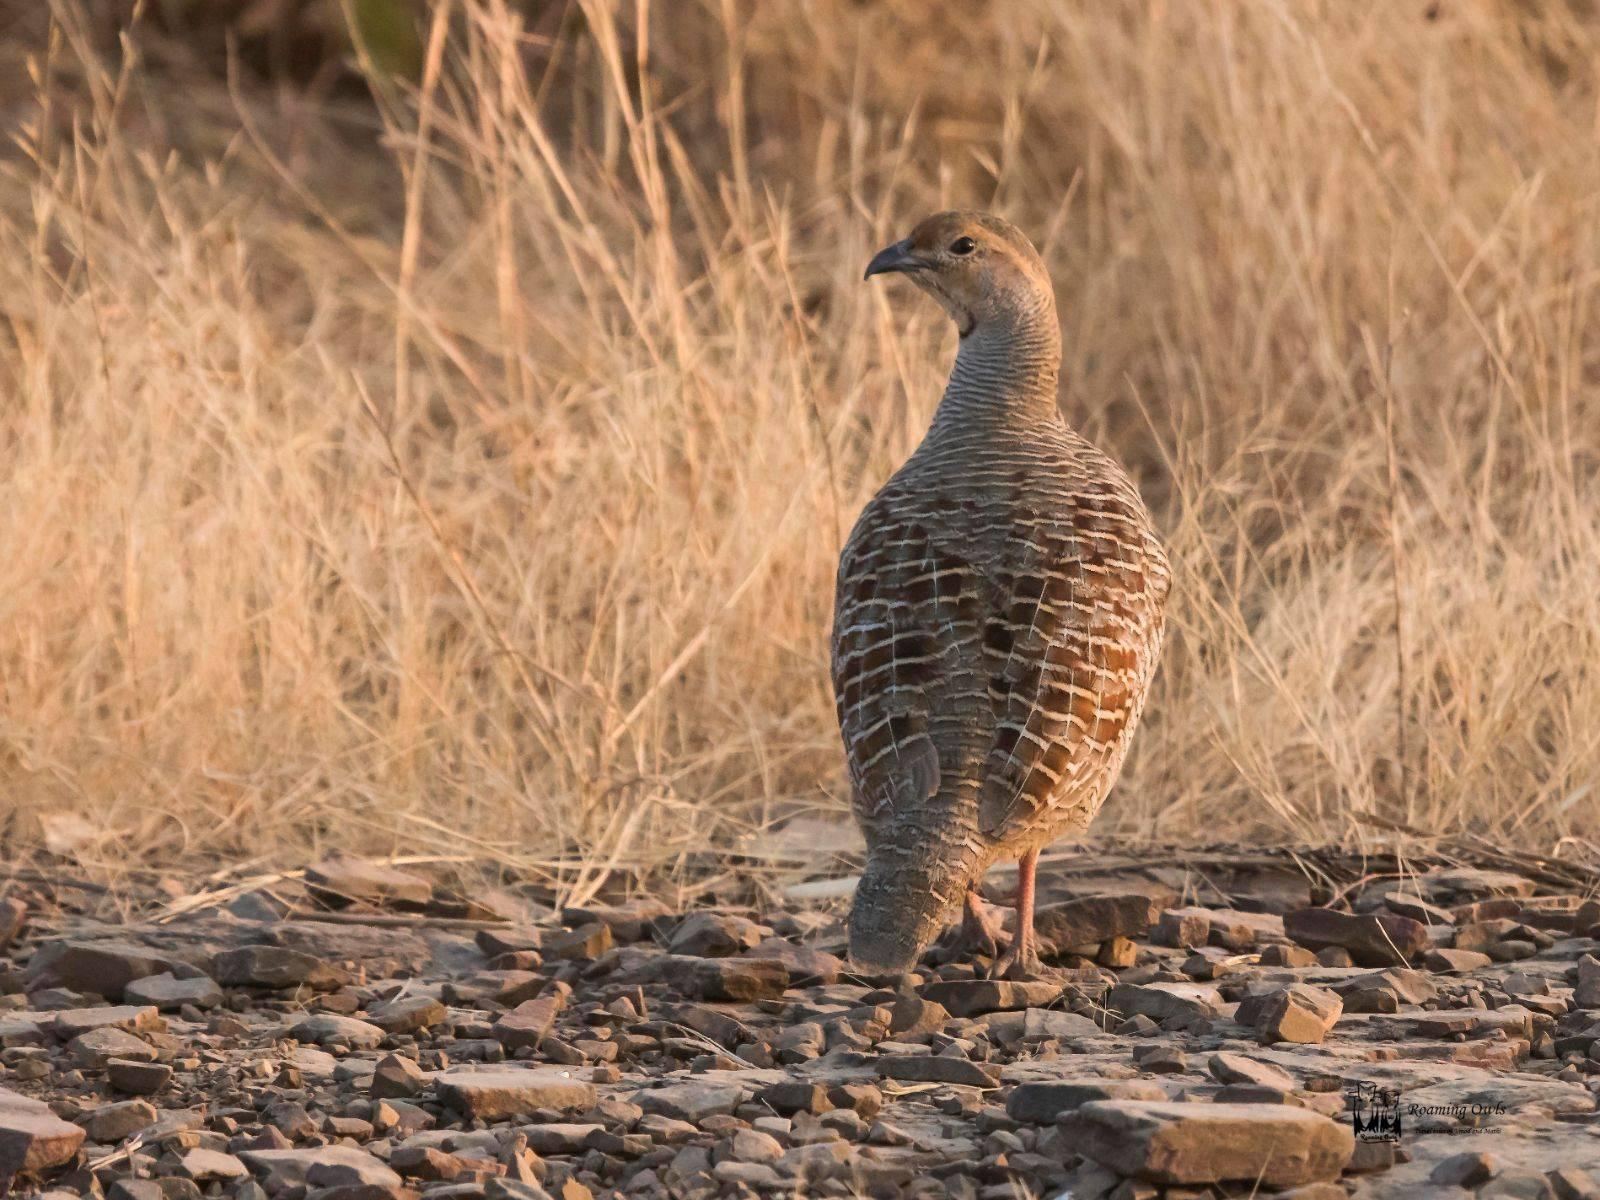 Grey Francolin,Ranthampore Birding,Desert Dry birds,Indian Birds